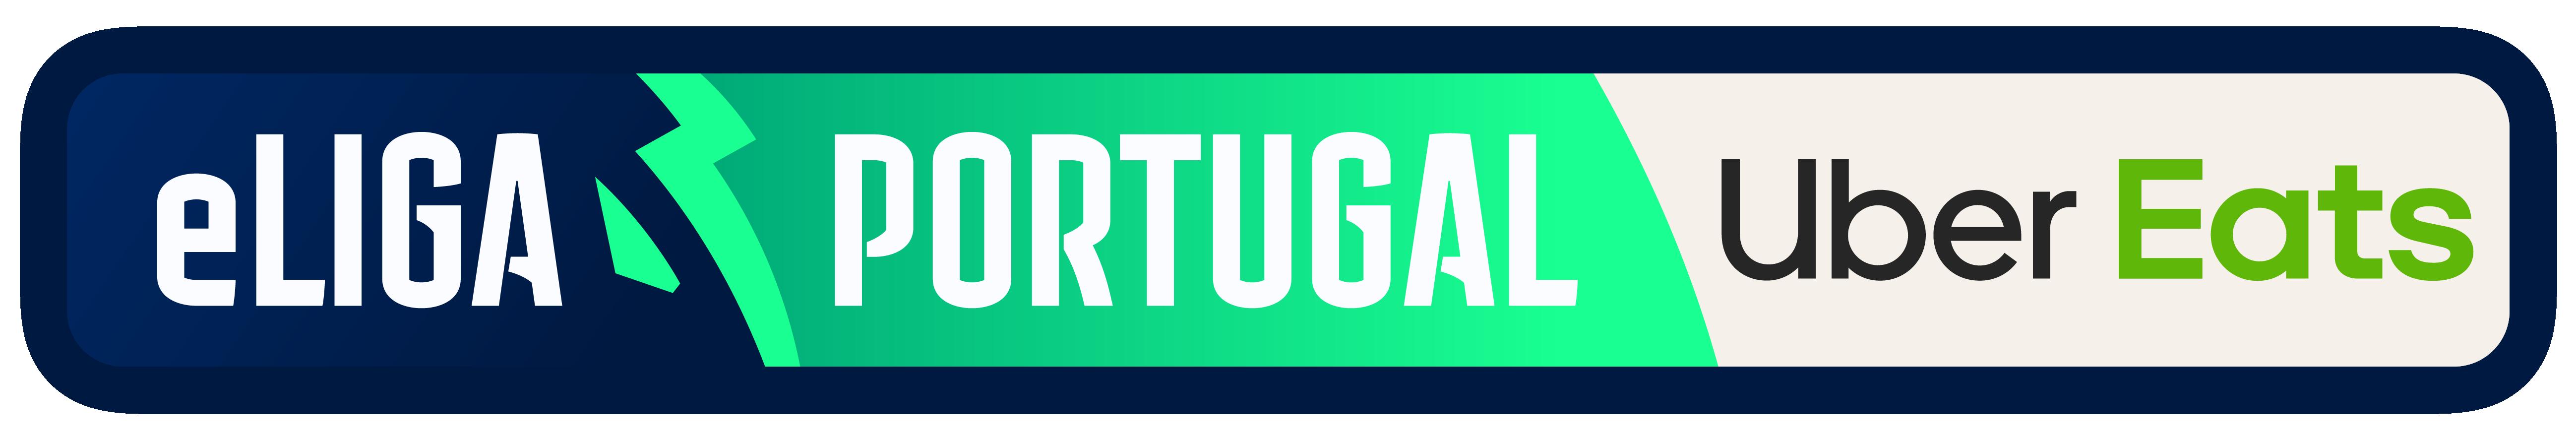 eLigaPortugal